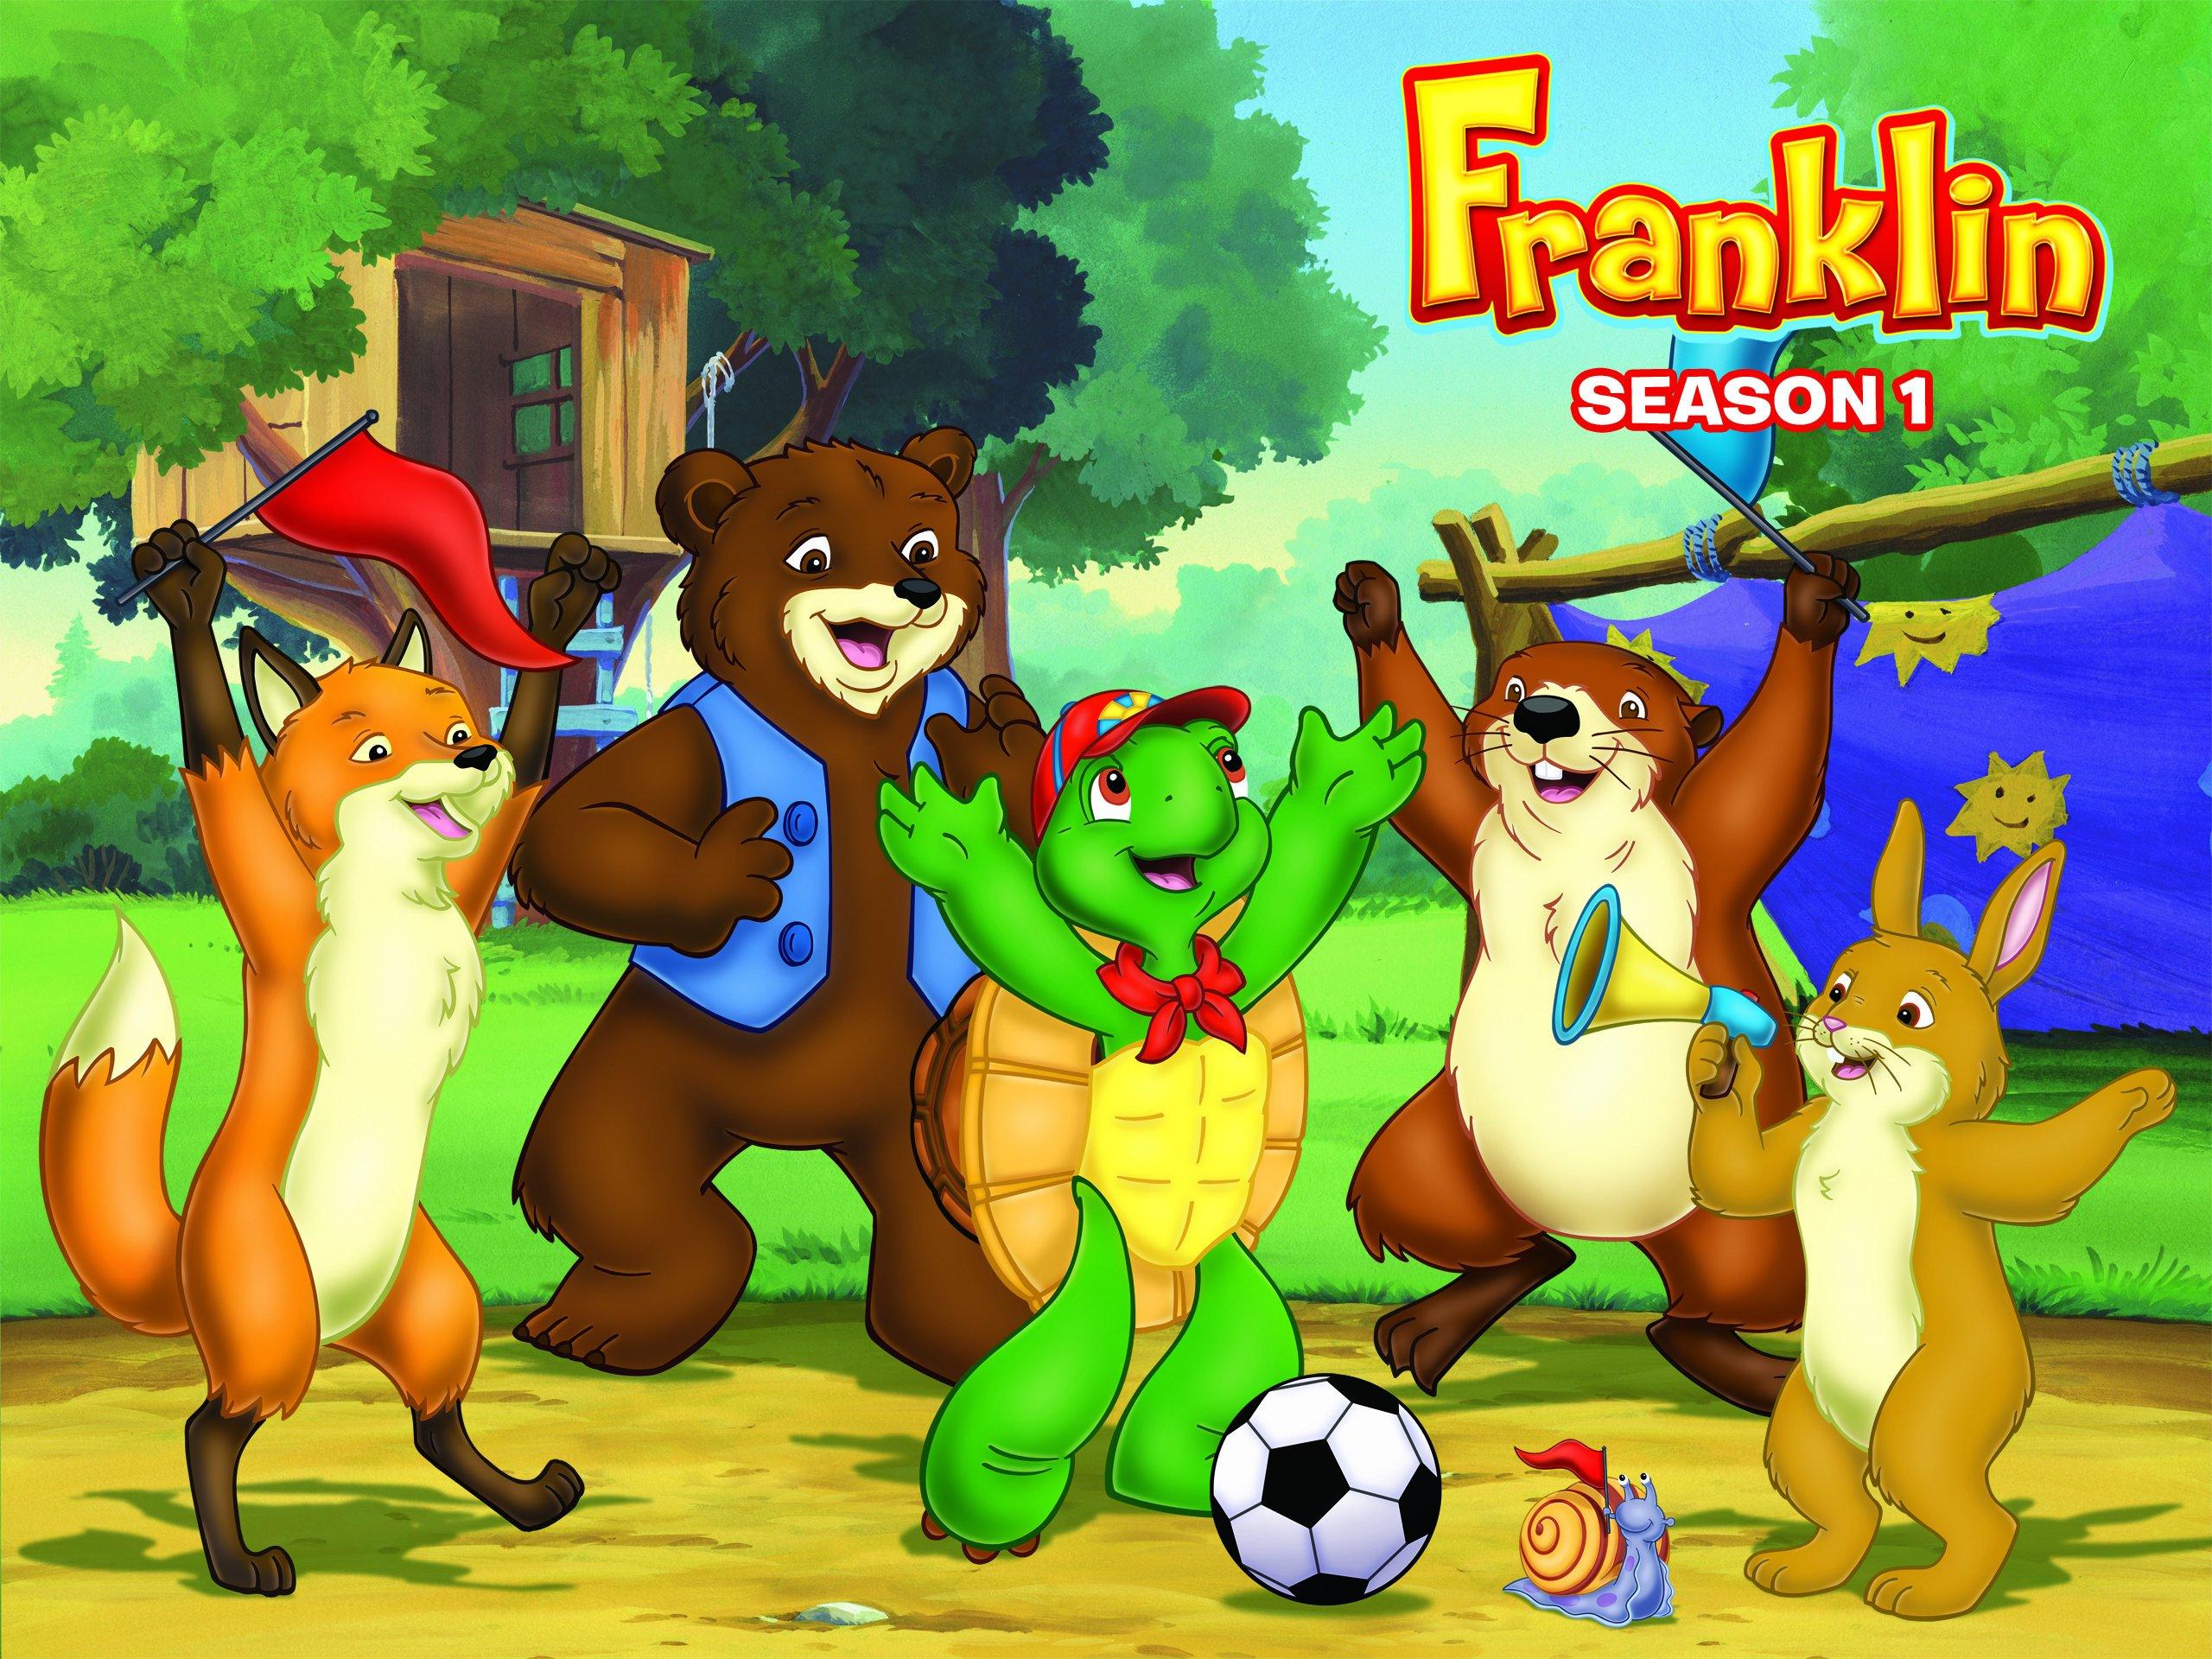 Uncategorized Cartoon Franklin amazon com franklin season 1 noah reid richard newman elizabeth brown leah cudmore cody jones olivia garratt kyle fairlie kristin